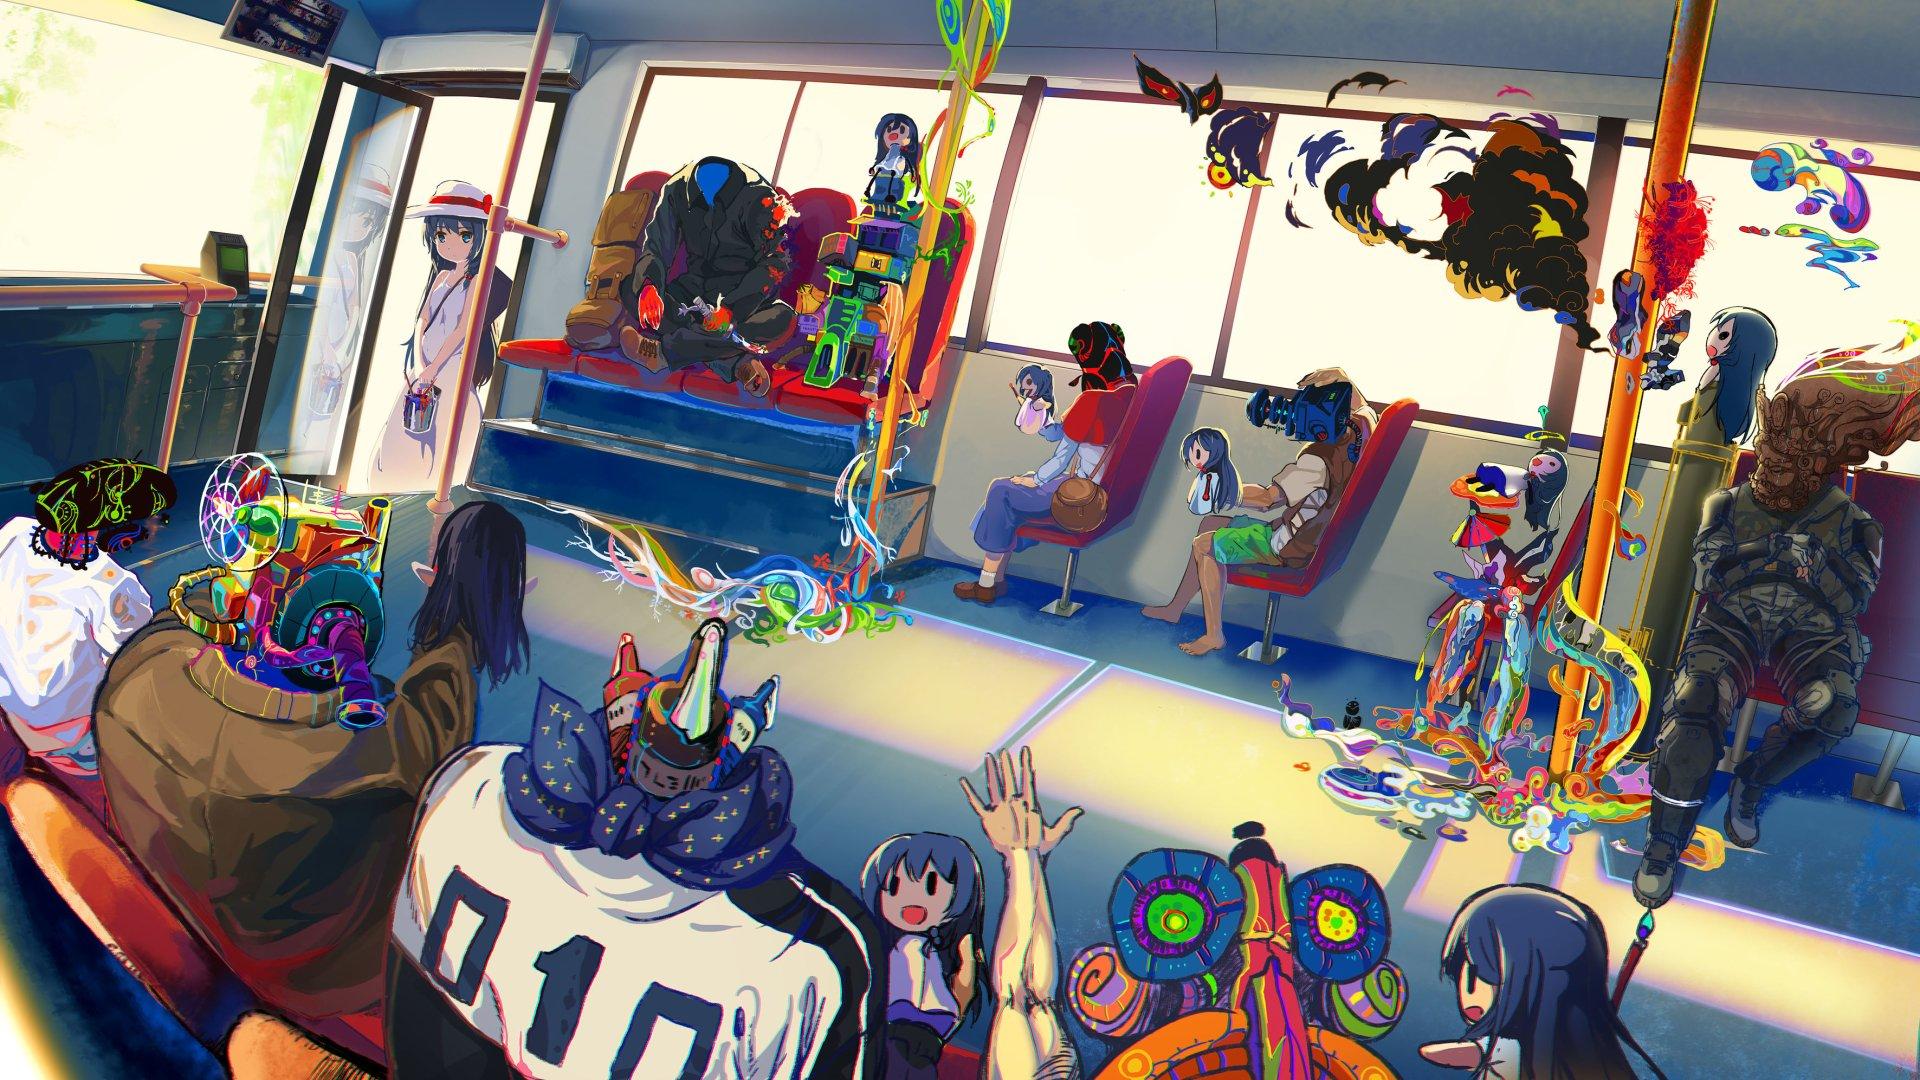 Anime - Original  Fantasy Girl Bus Wallpaper